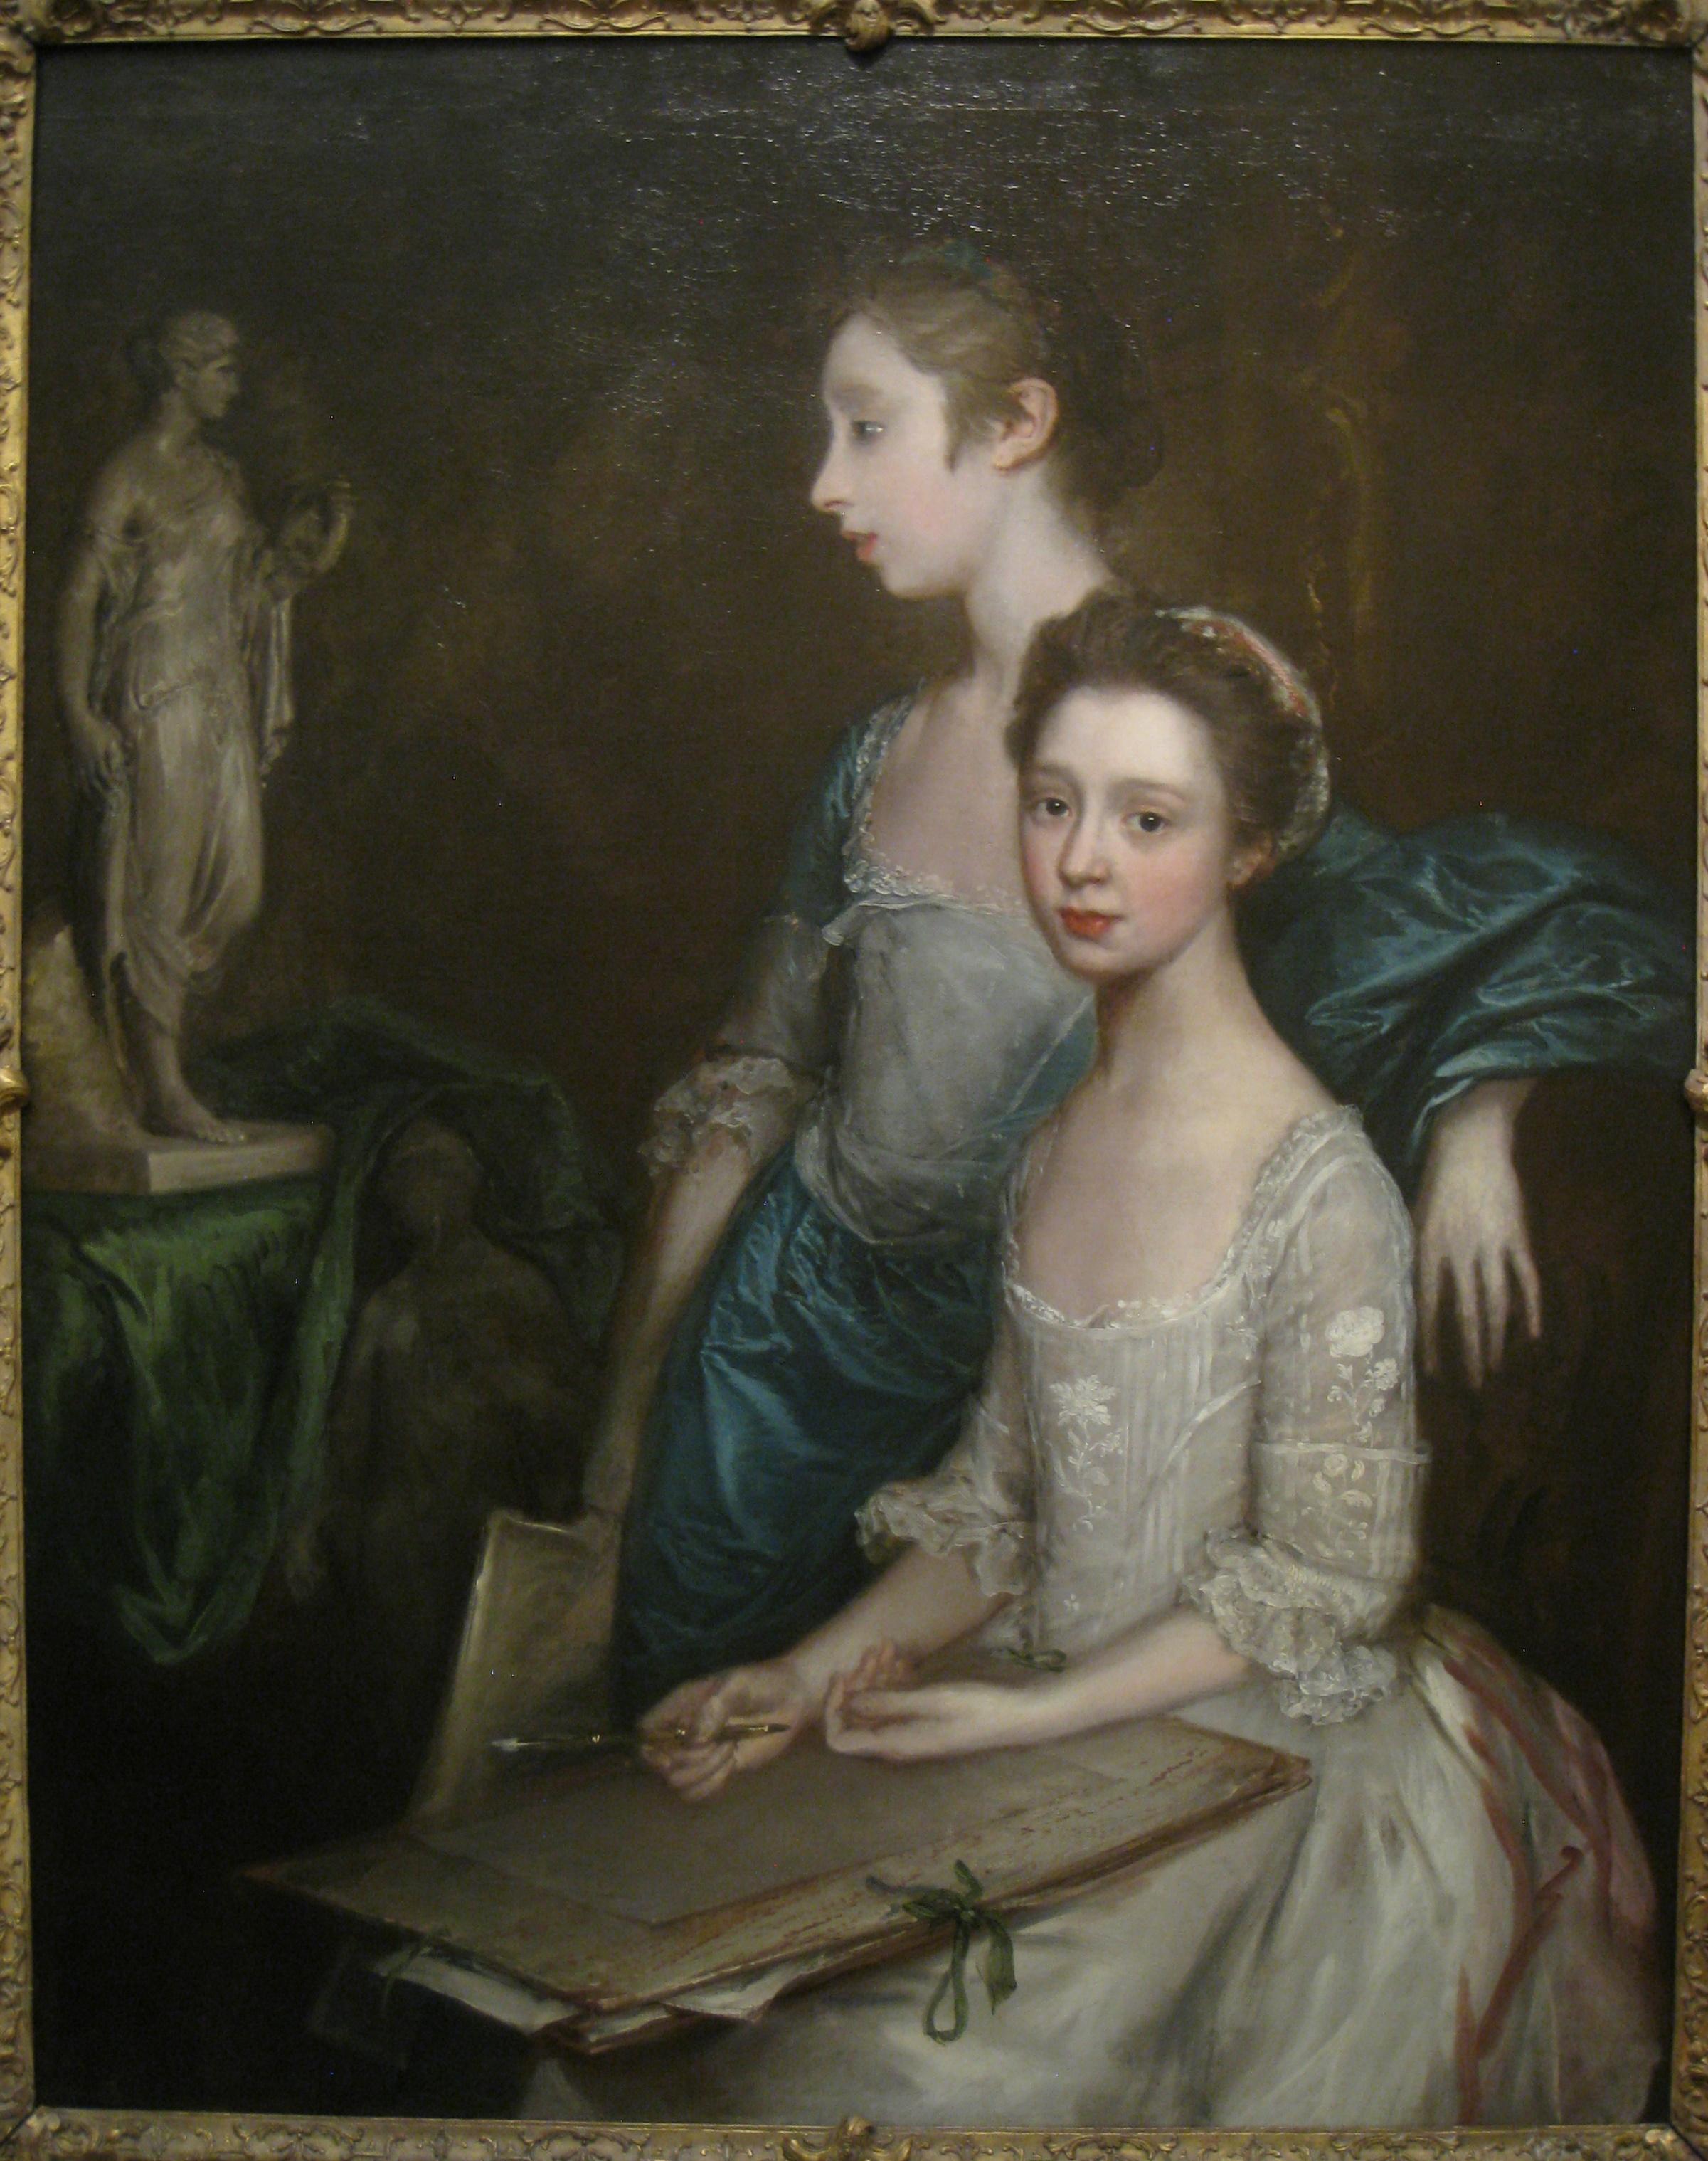 Artist Thomas Gainsborough: biography and creativity 77